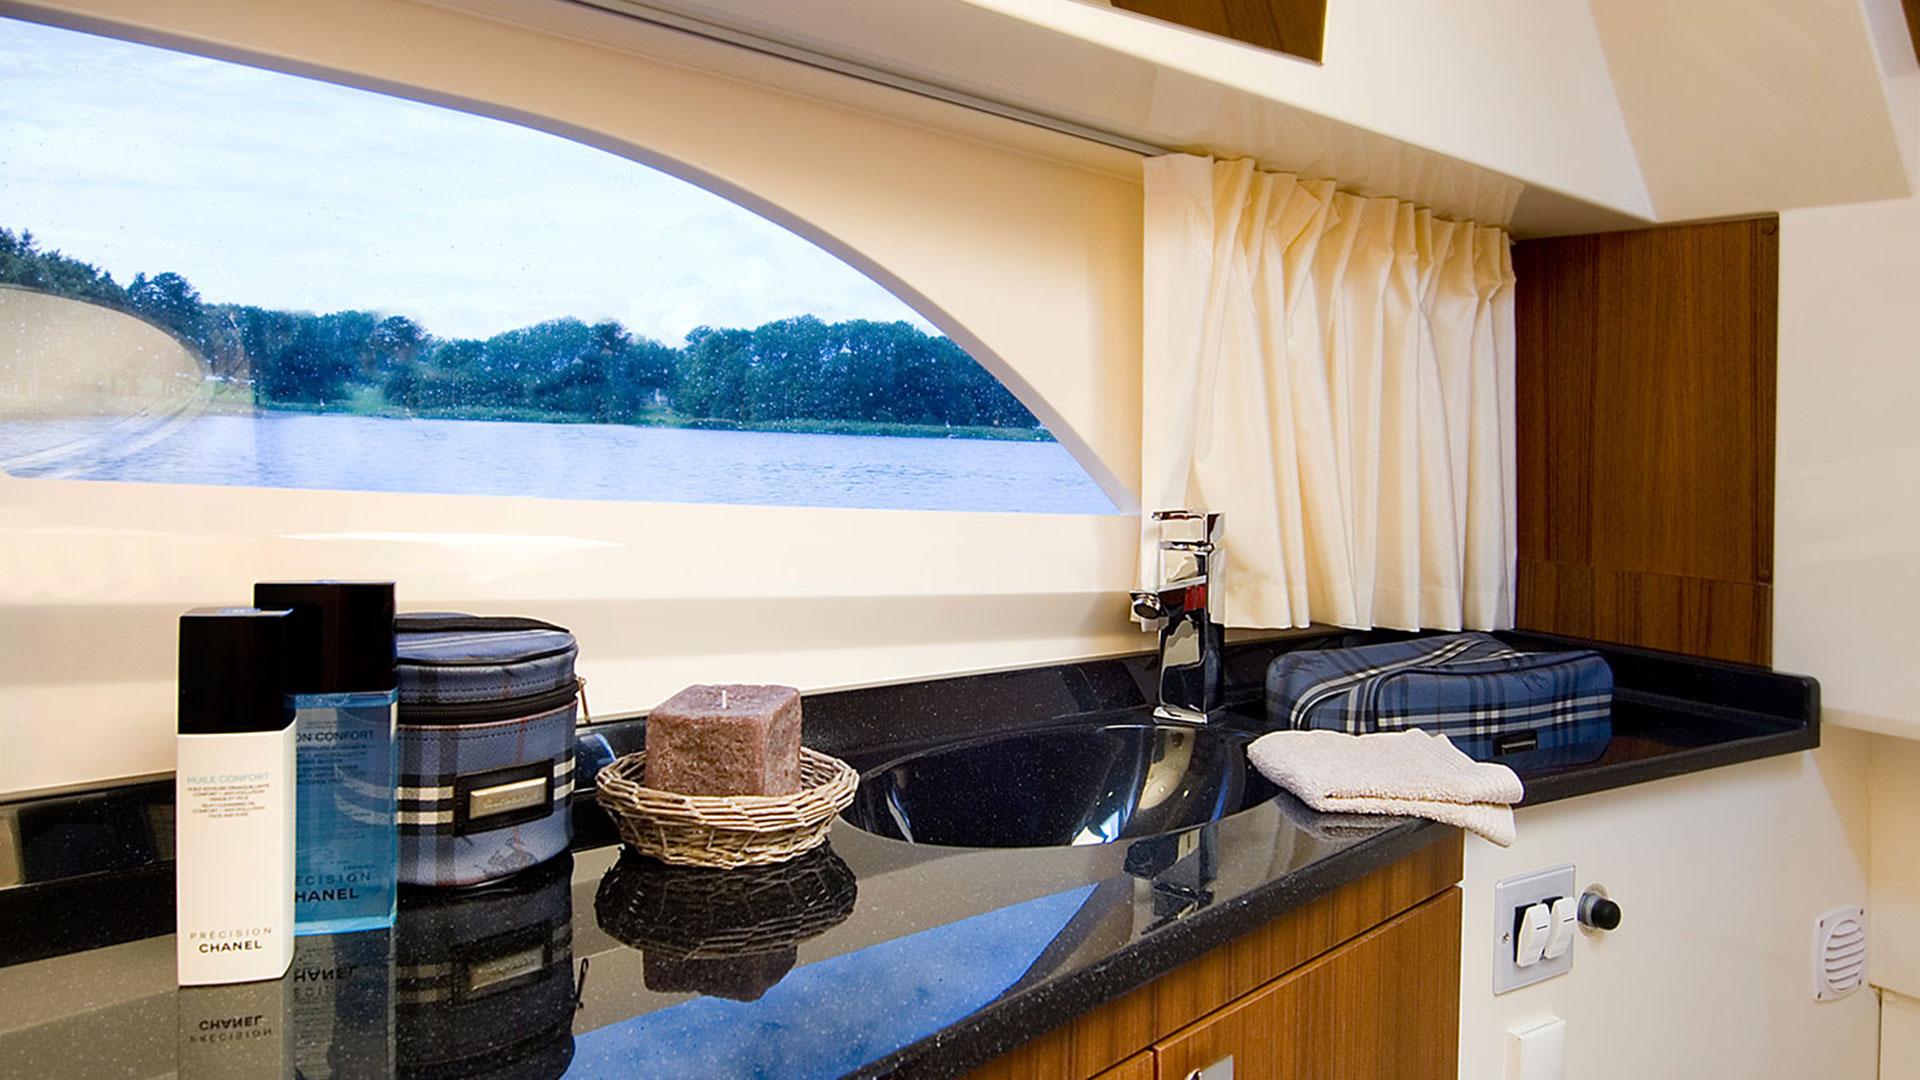 320 AFT Cabin Cruiser Interior 5